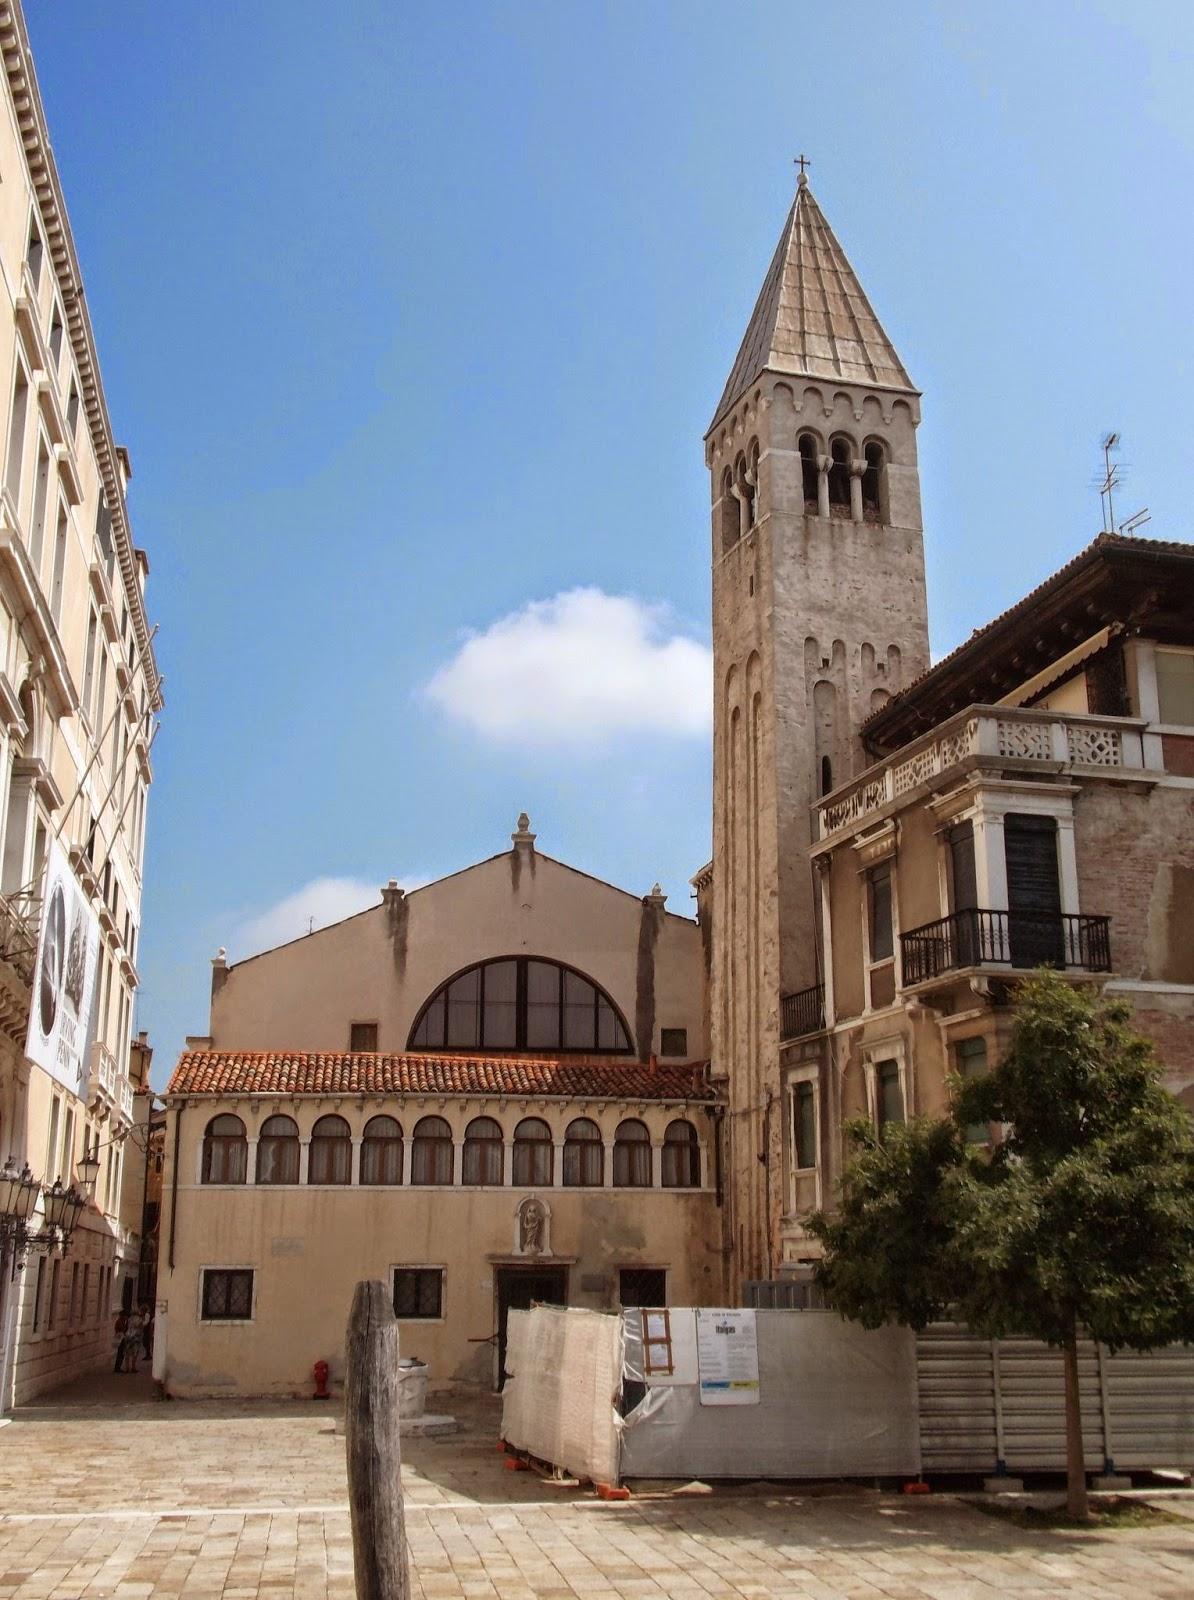 The church of San Samuele, Venice